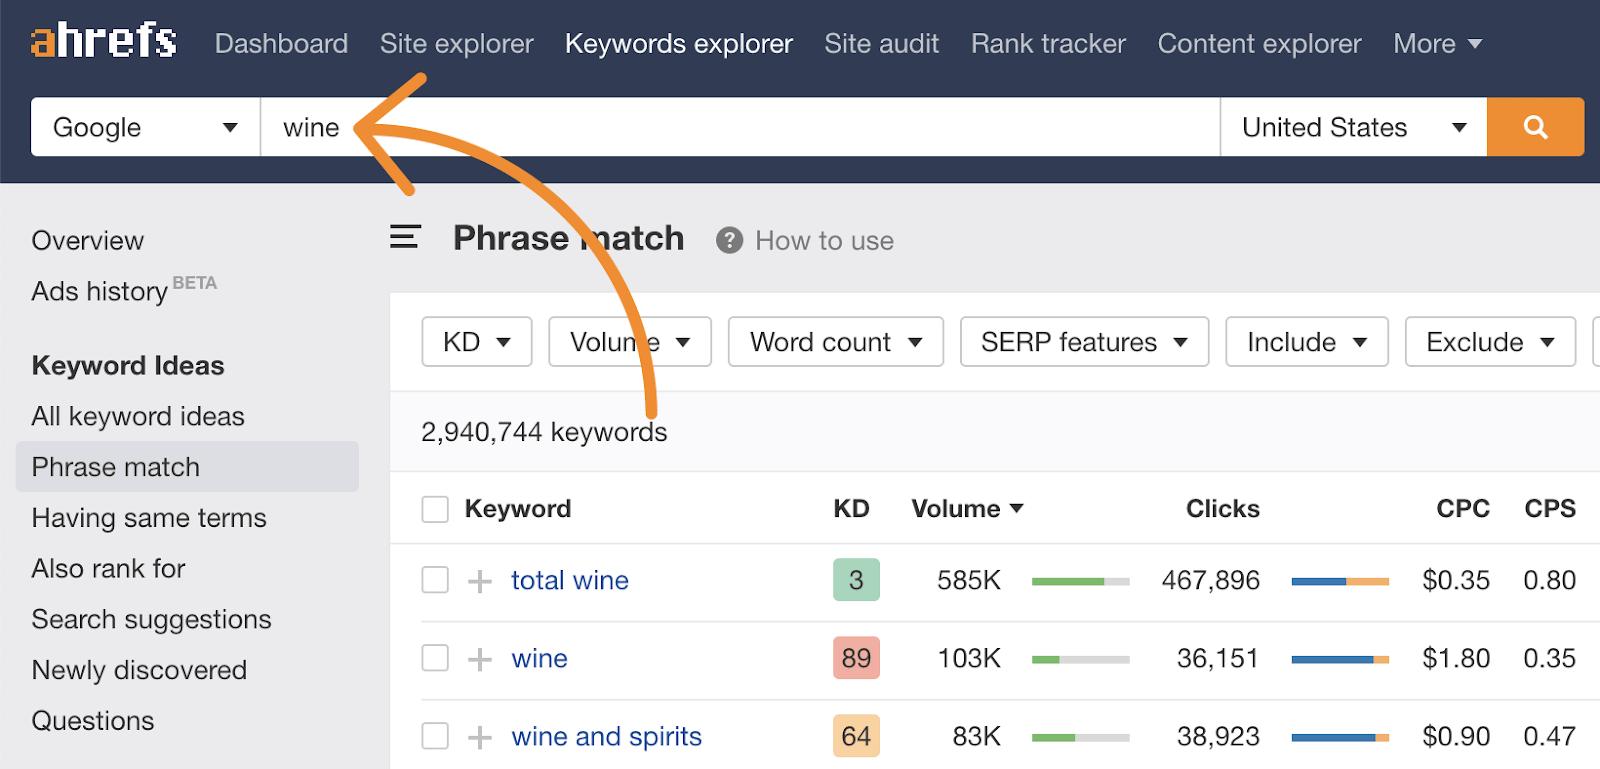 5 keywords explorer search hub page topic